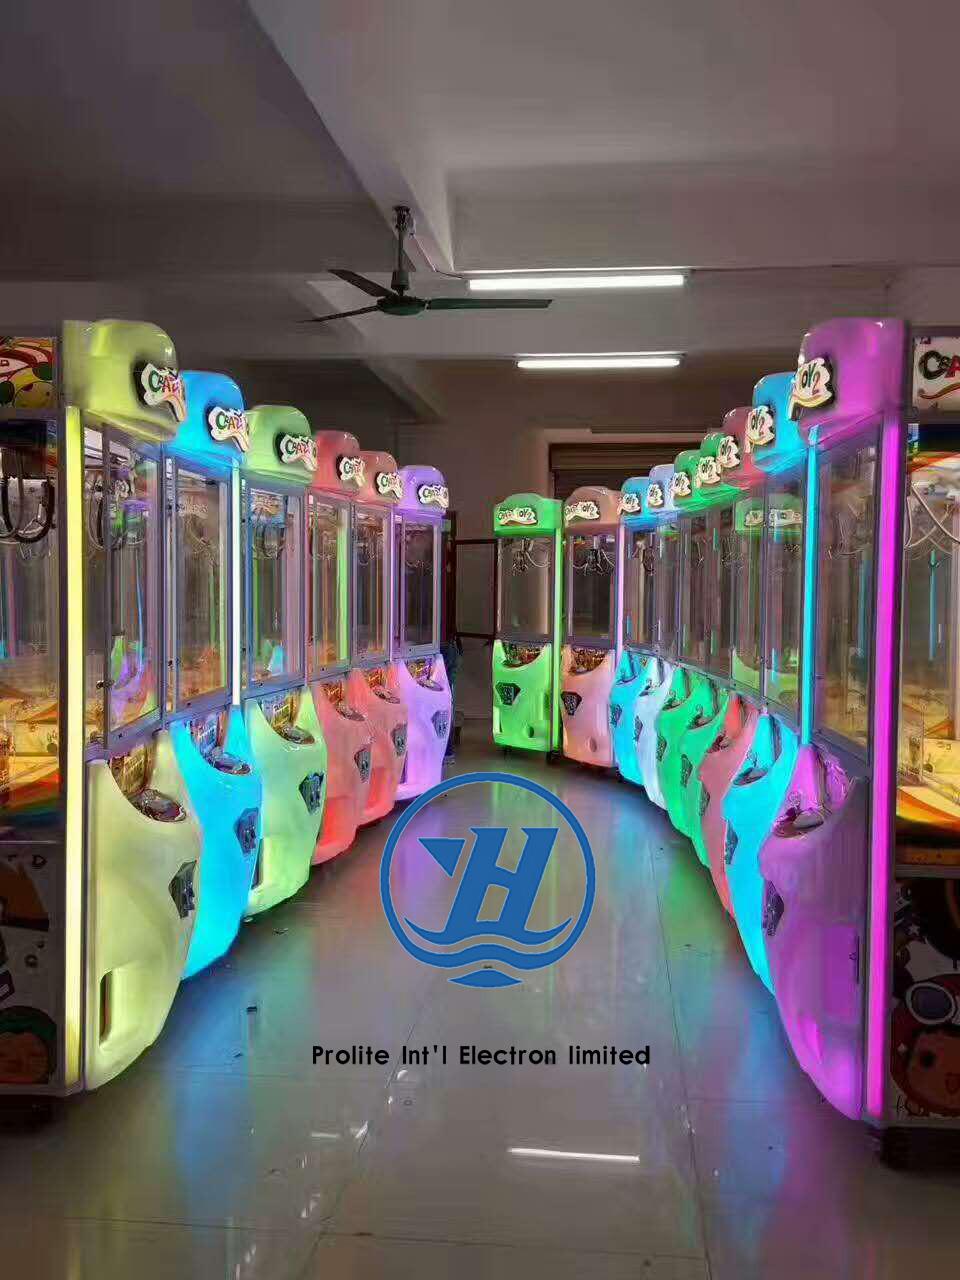 Prolite Int'l Electron Limited